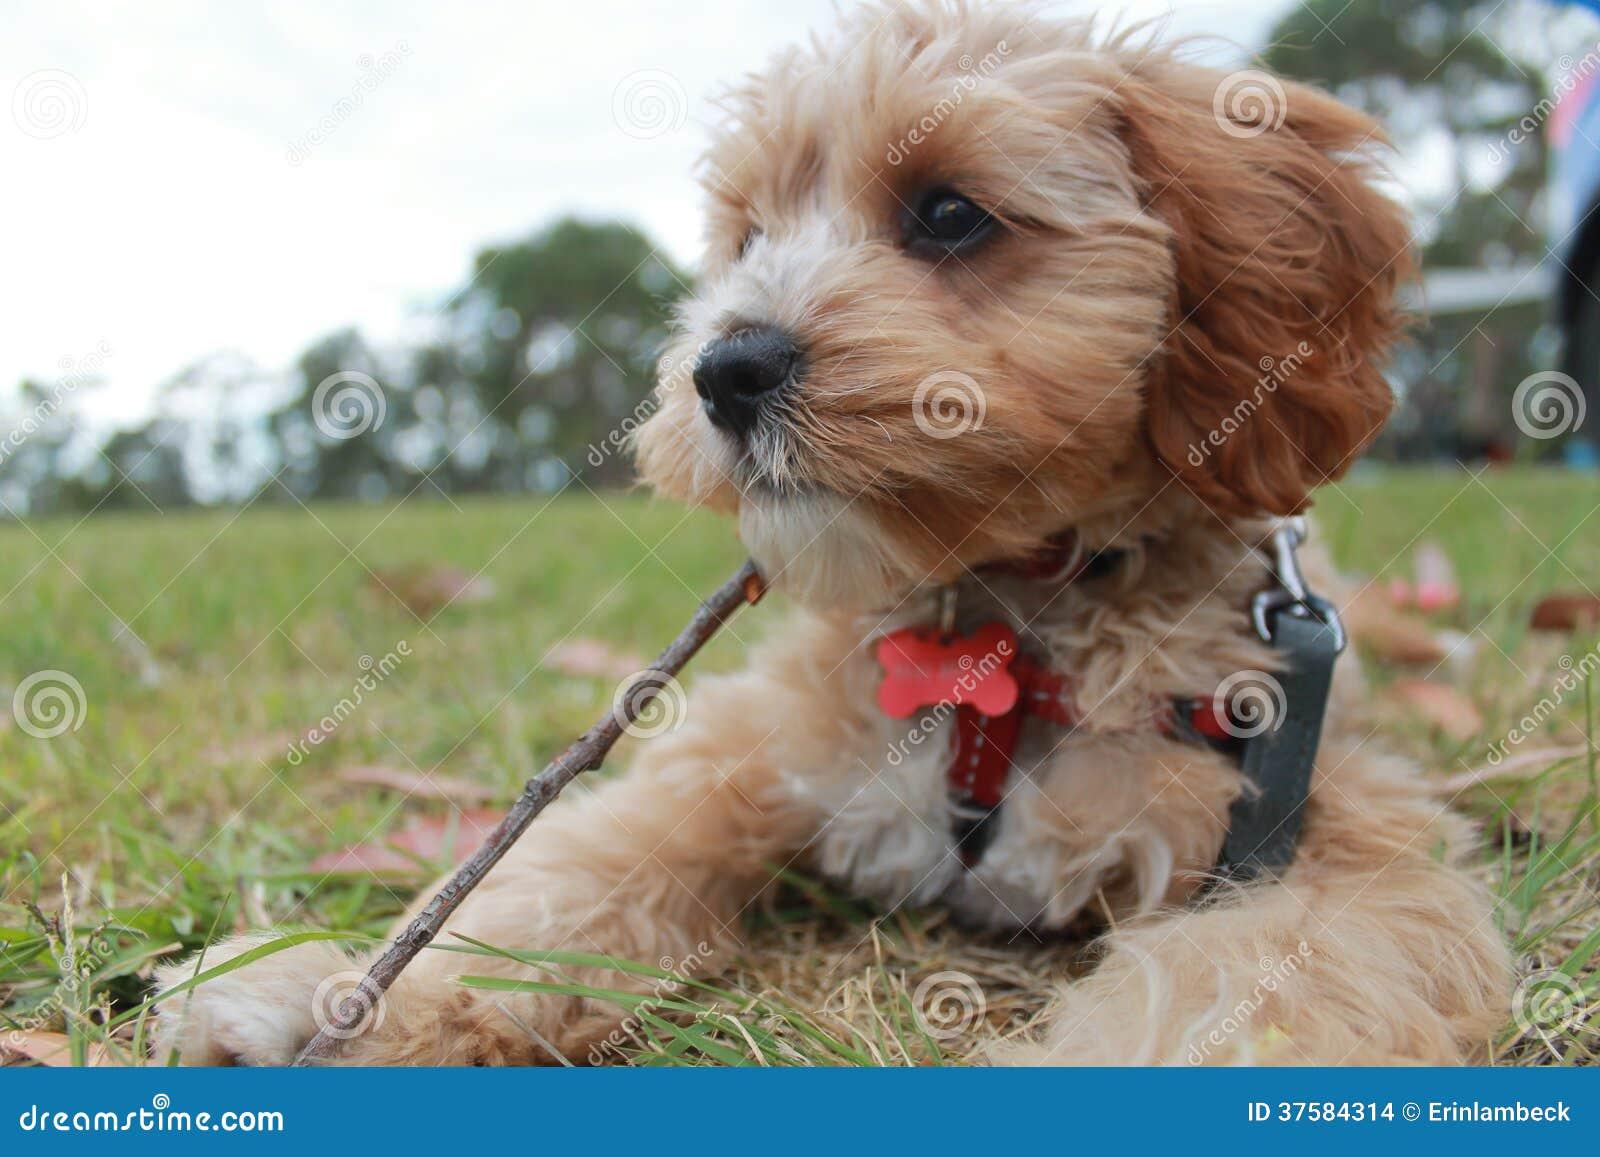 Cavoodle Dog For Sale Uk